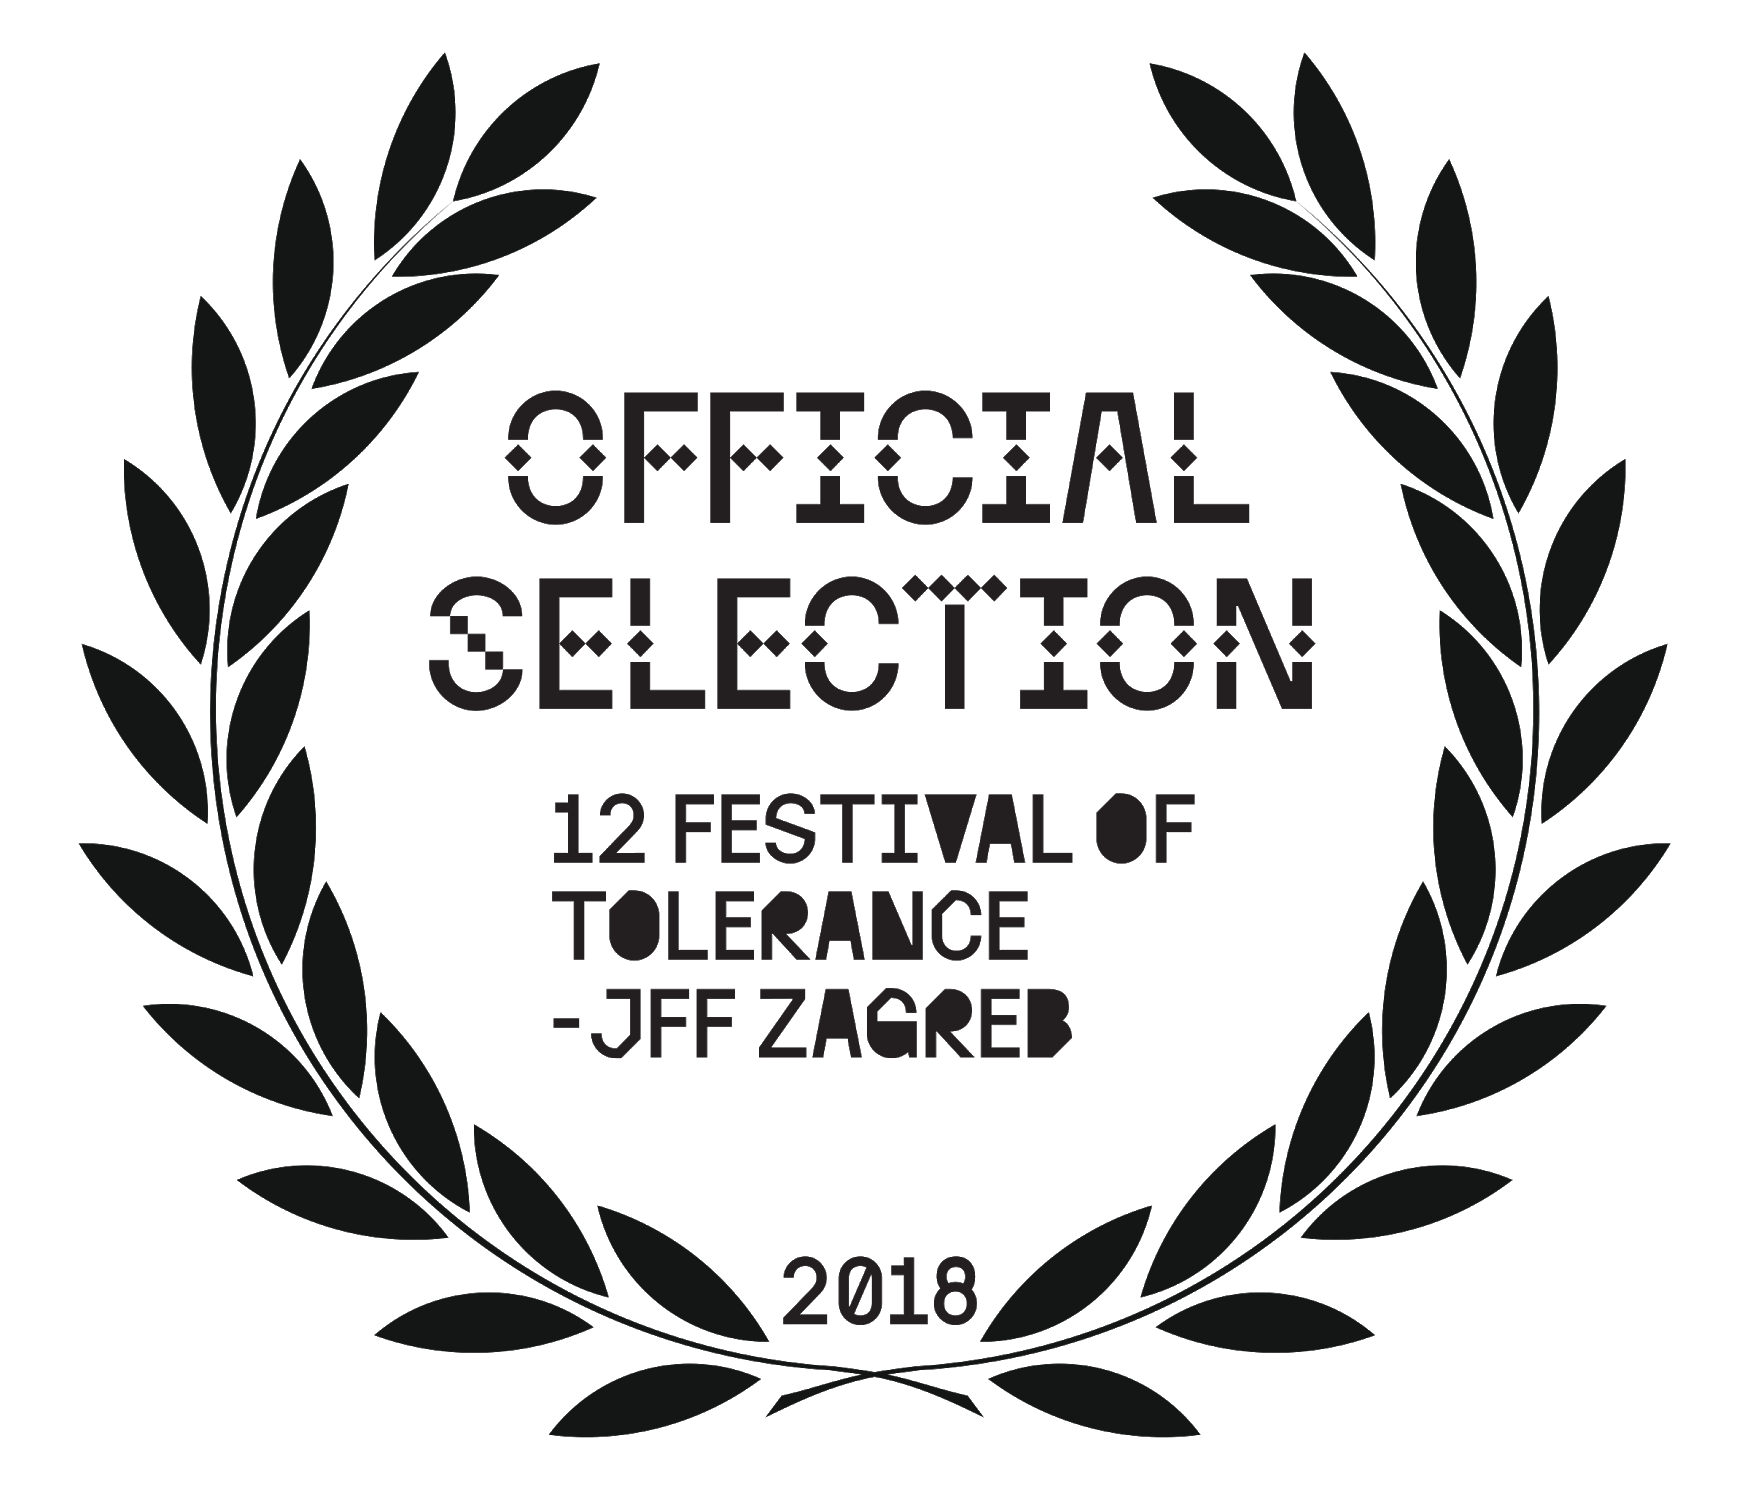 FESTIVAL OF TOLERANCE, ZAGREB, CROATIA - April 8-14, 2018